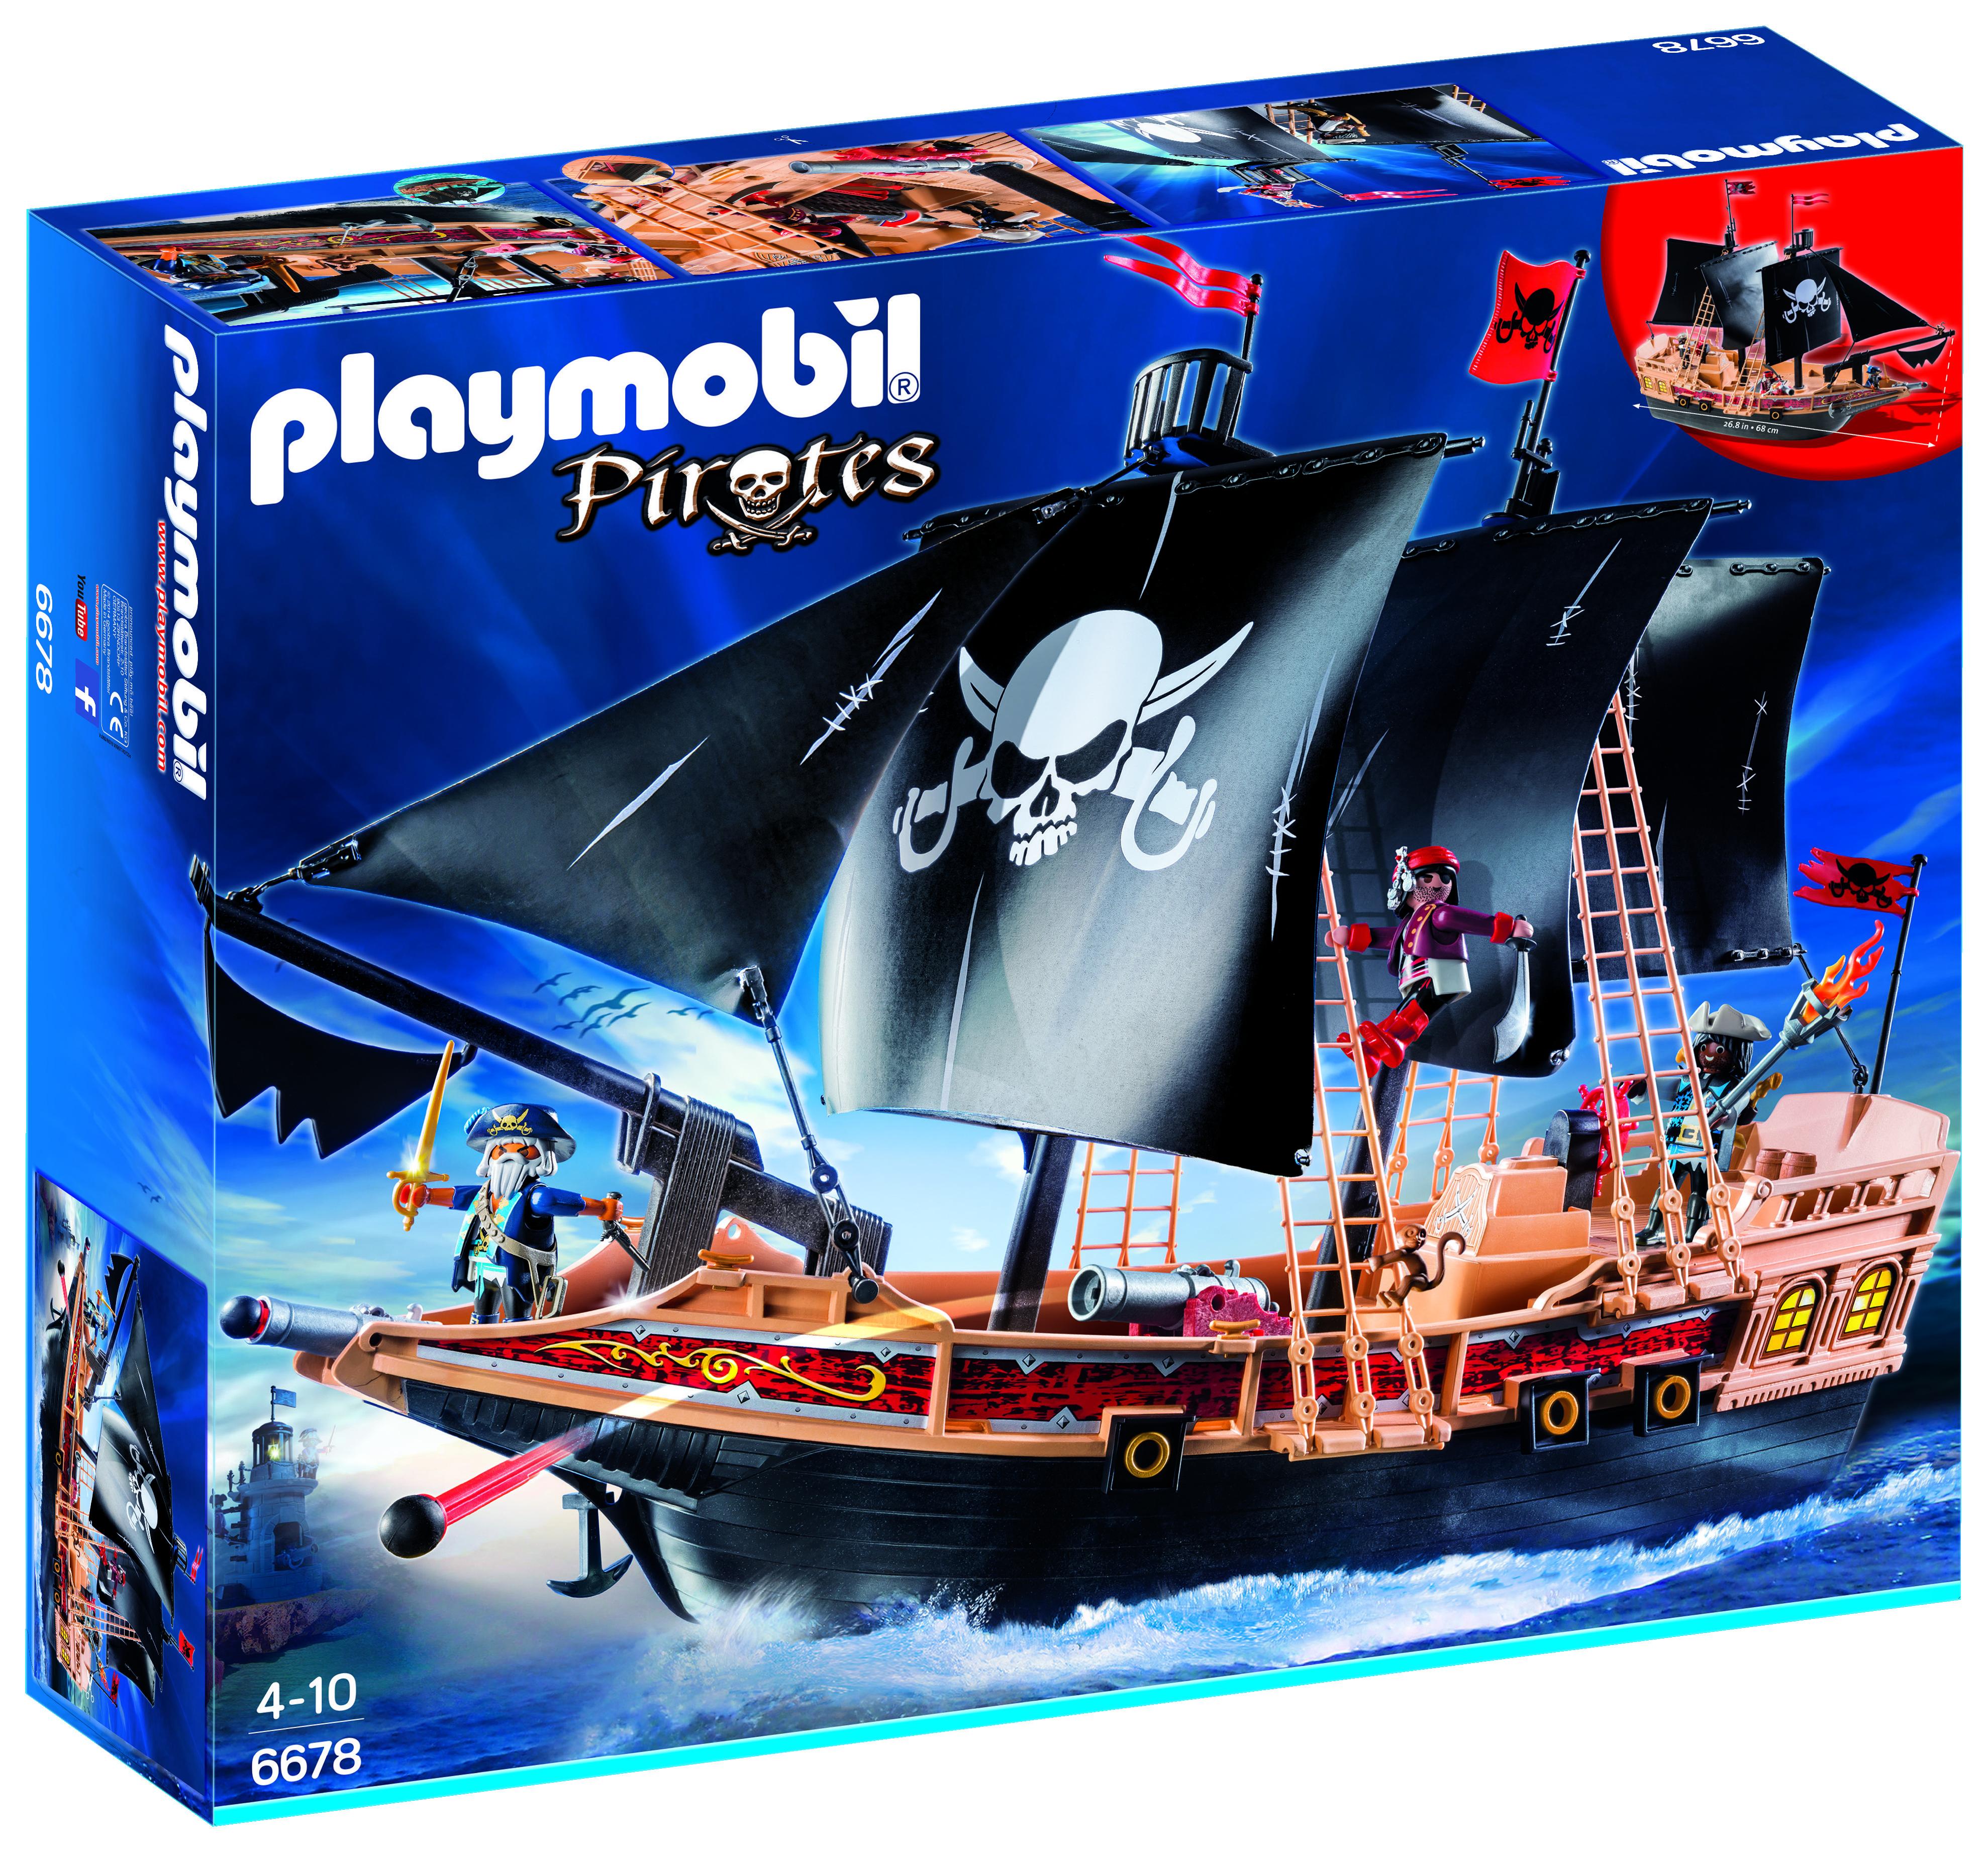 Bateau pirates des ténèbres - Playmobil - 6678